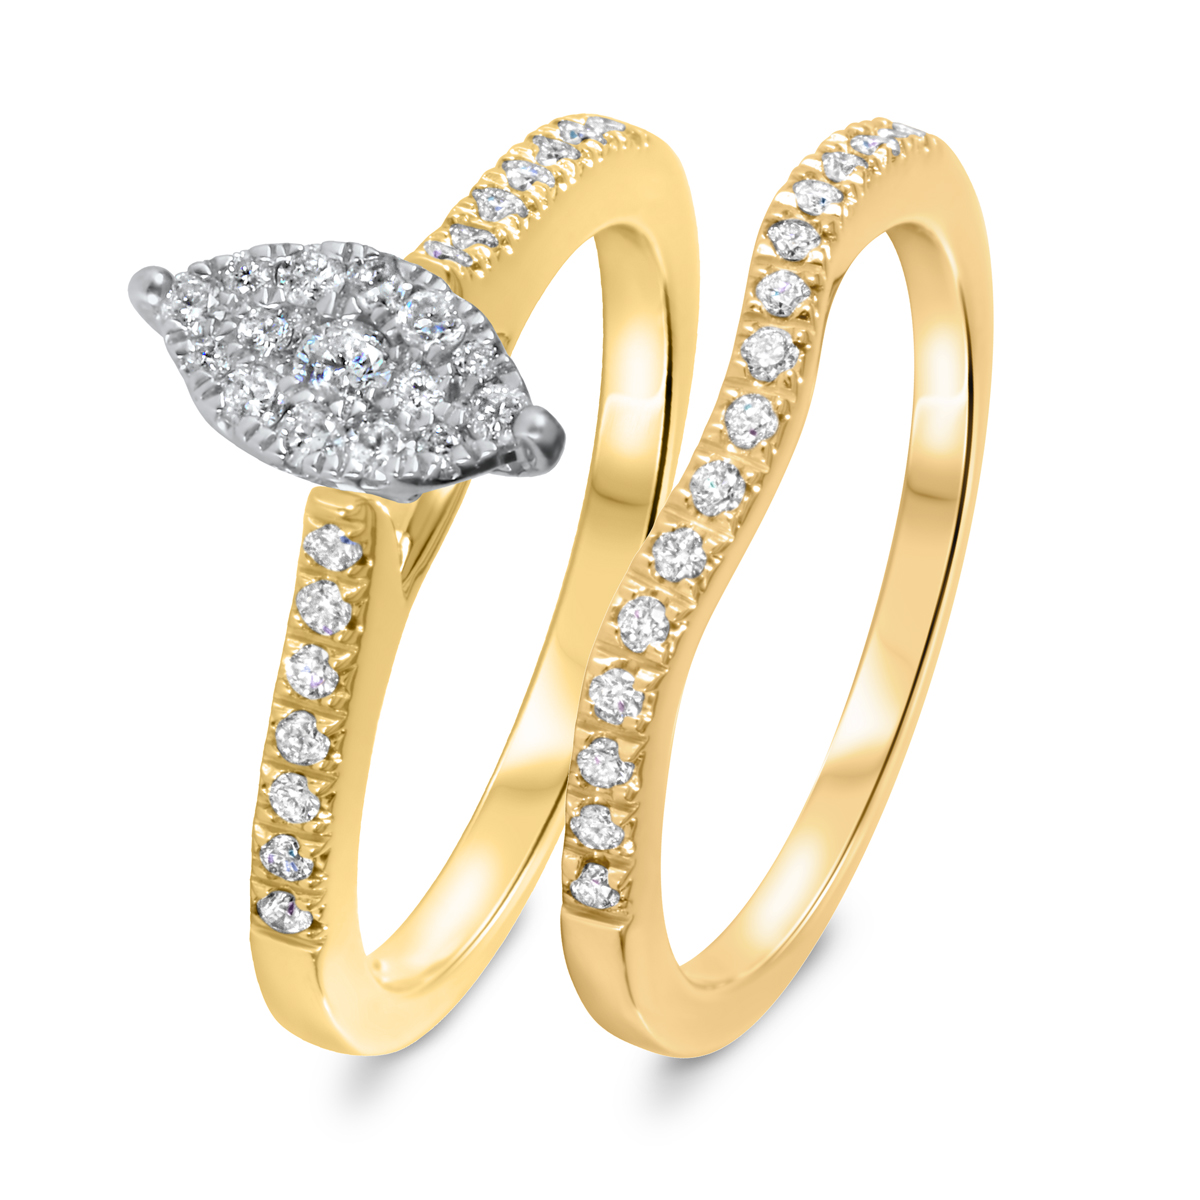 3/8 CT. T.W. Diamond Women's Bridal Wedding Ring Set 14K Yellow Gold